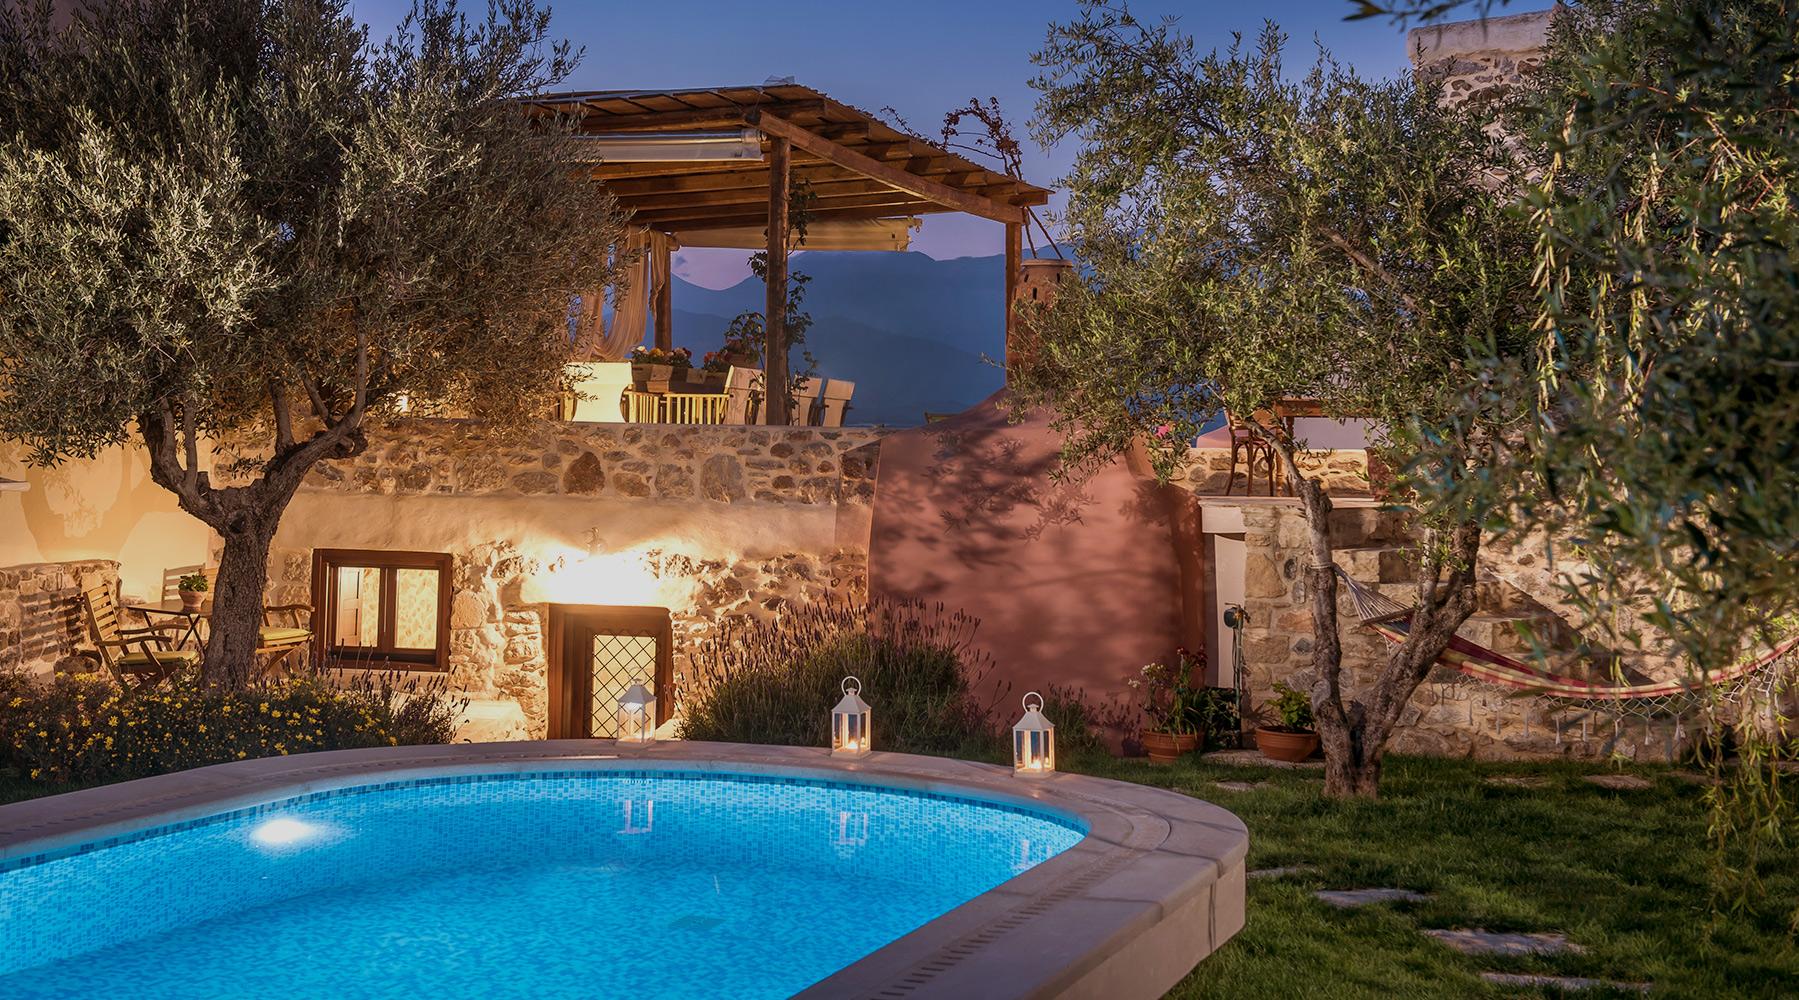 South_Crete_Villas_04